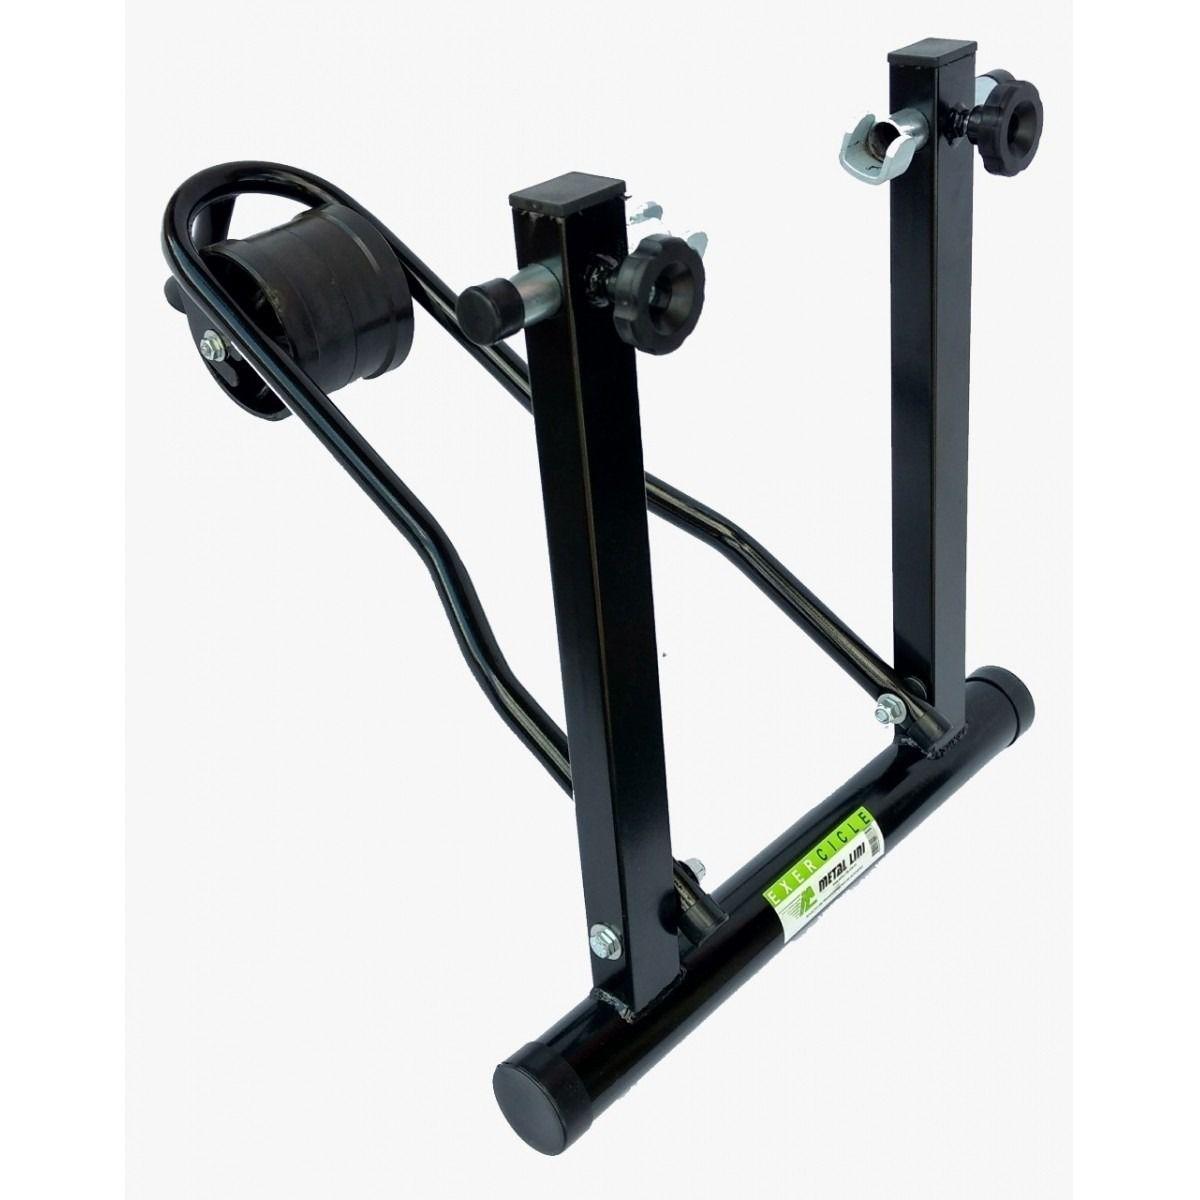 Rolo de treinamento para bikes METAL LINI Exercicle - Dobravél